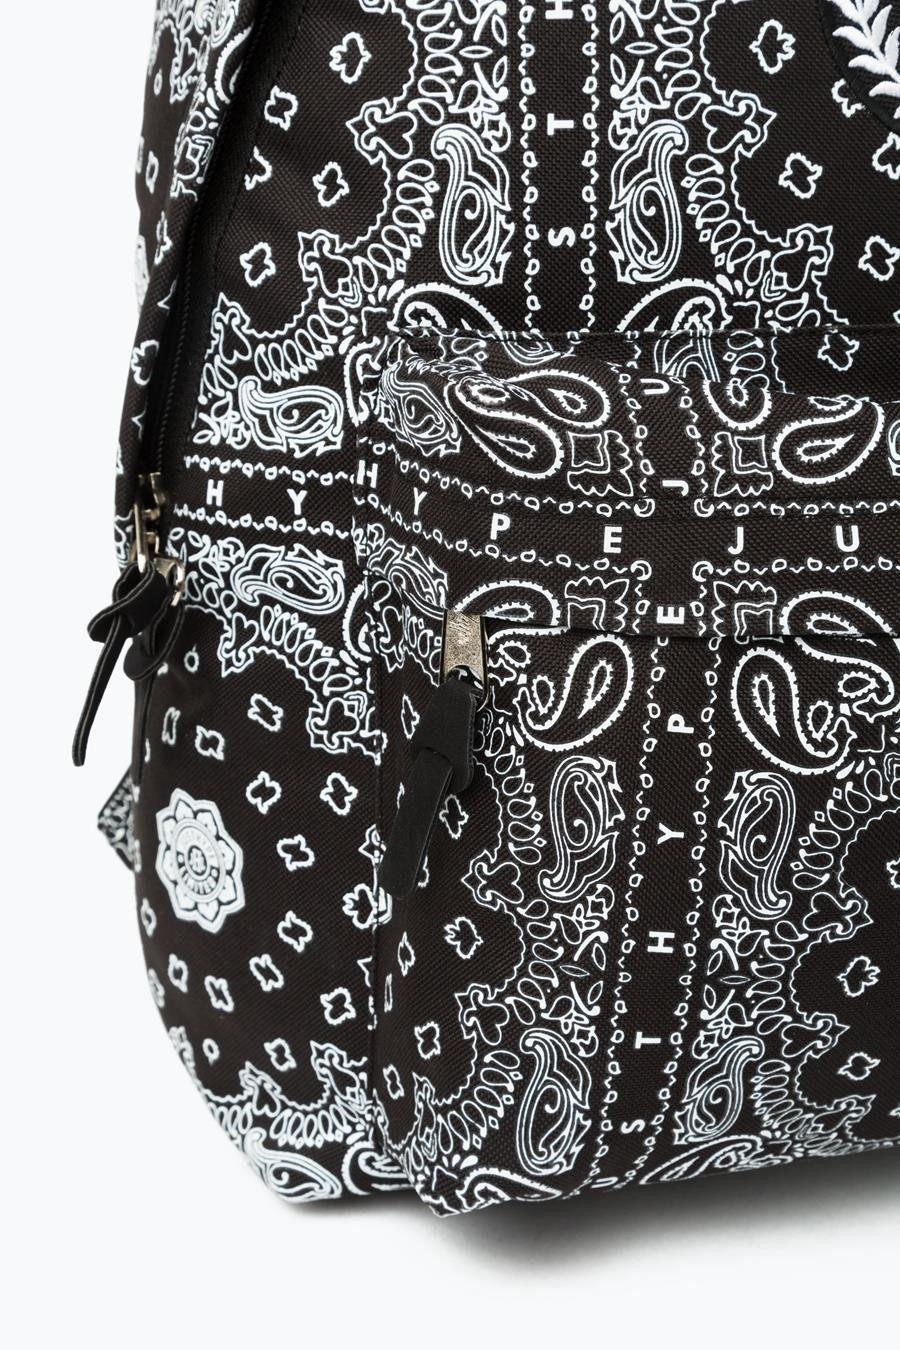 HYPE Black/White Bandana Backpack